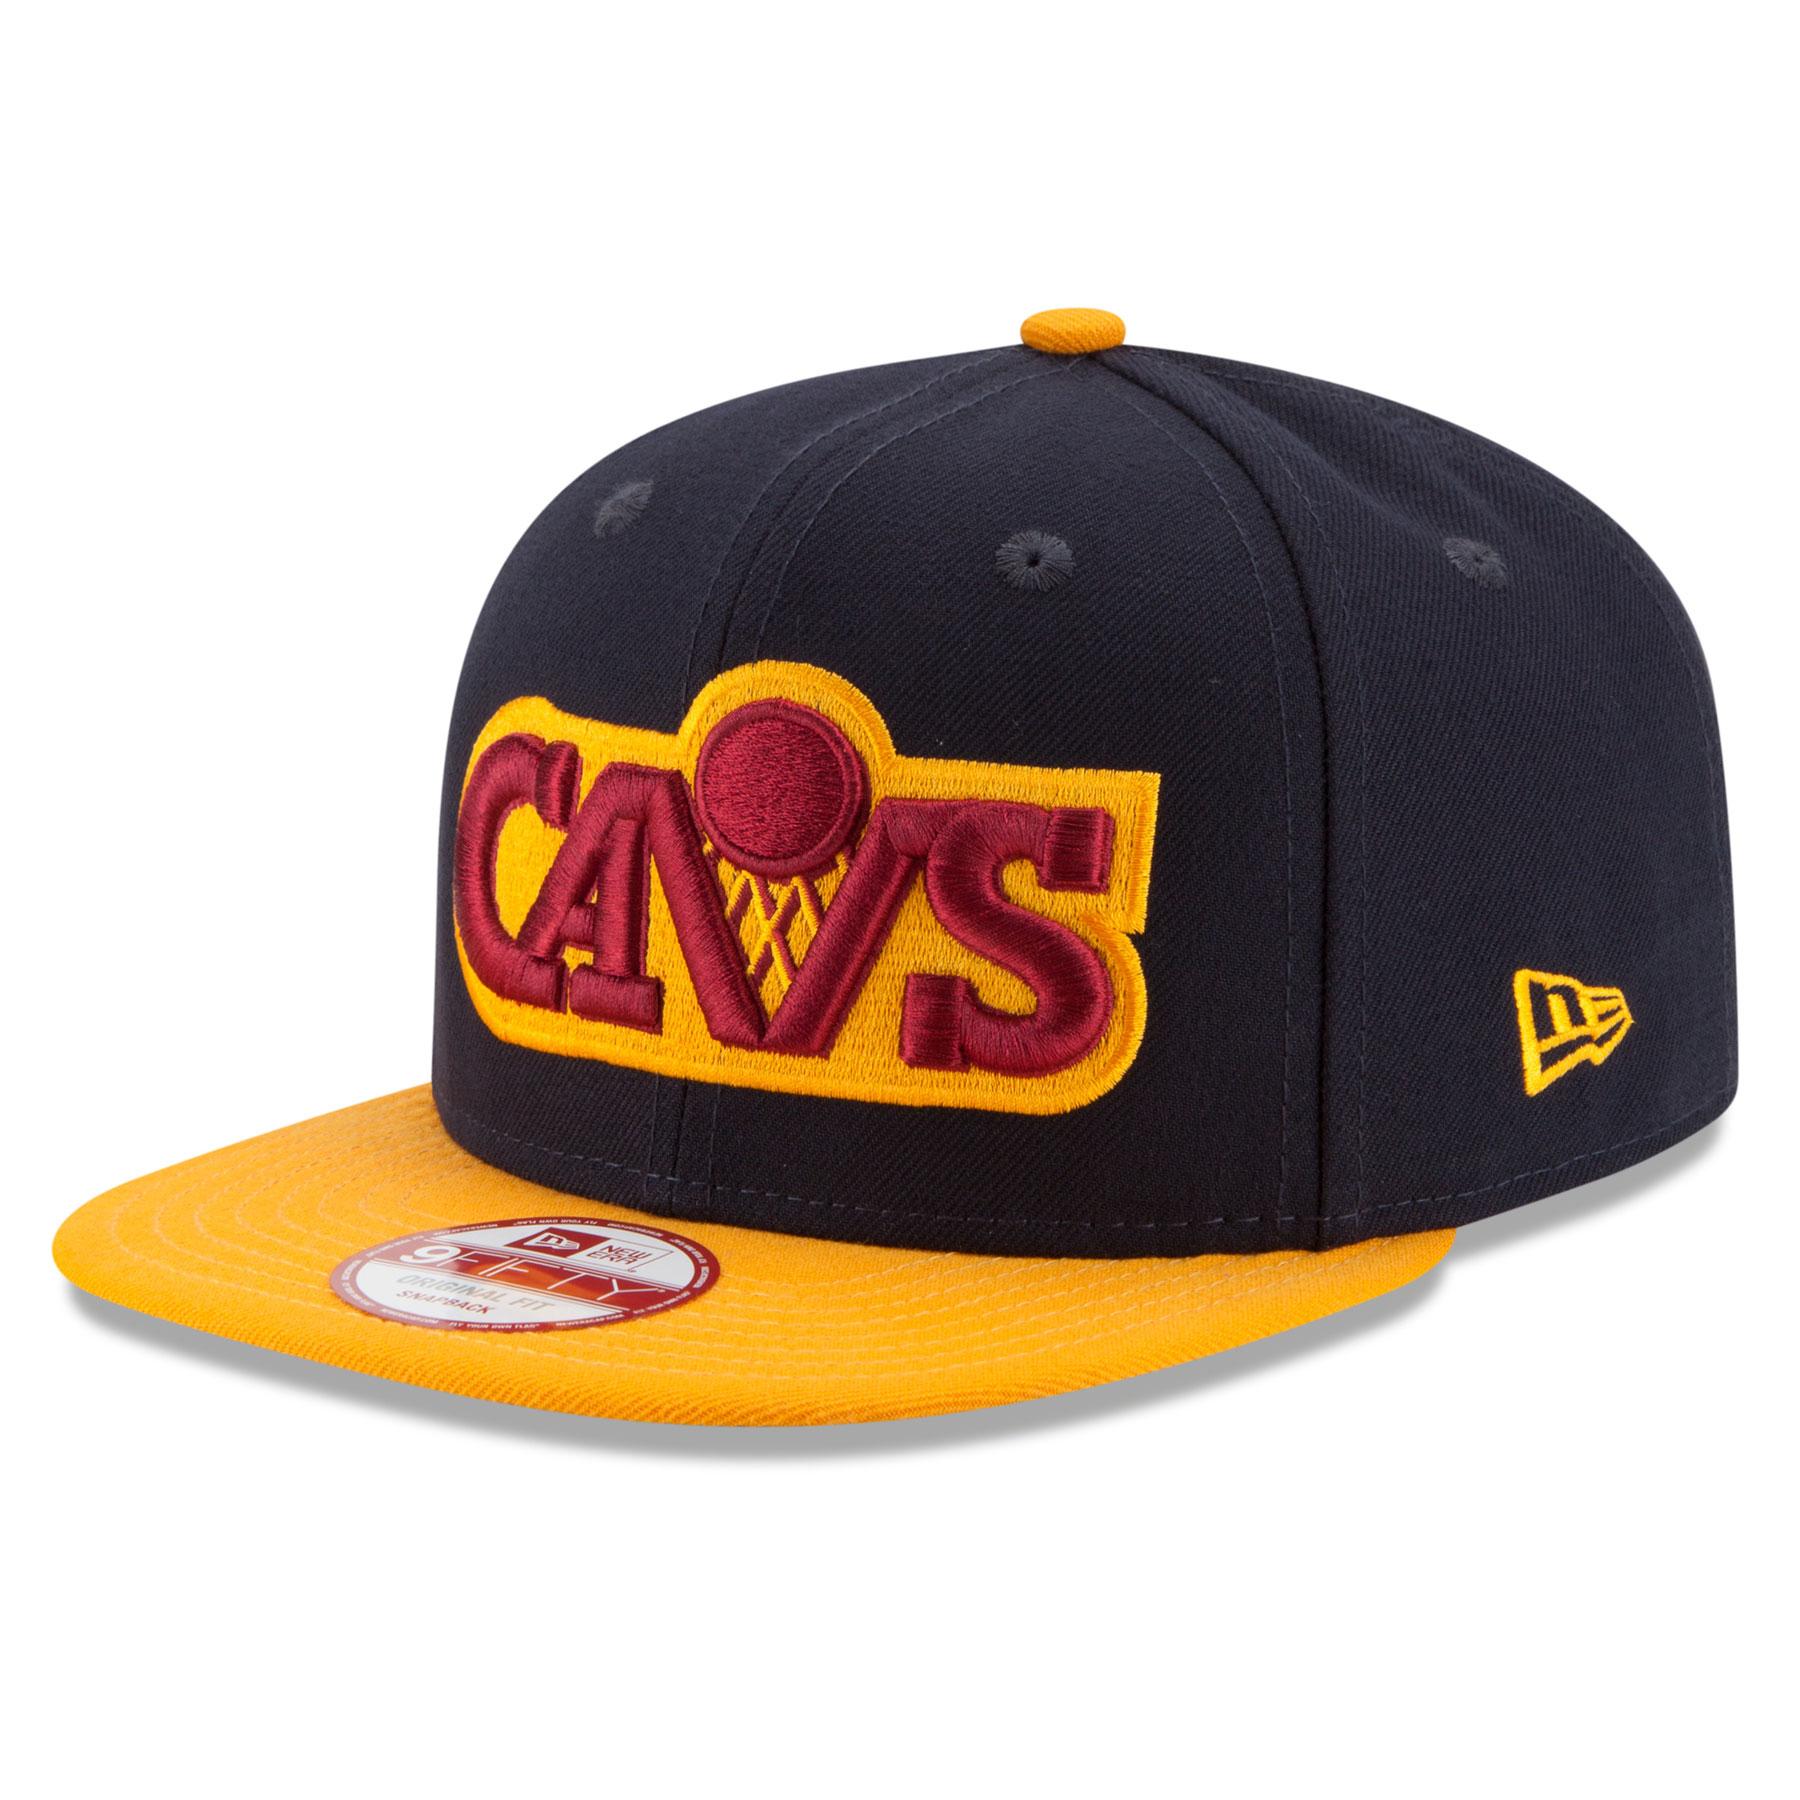 ad0d56d67e4 Cleveland Cavaliers New Era 9FIFTY NBA 2-Tone Basic Snapback Cap ...